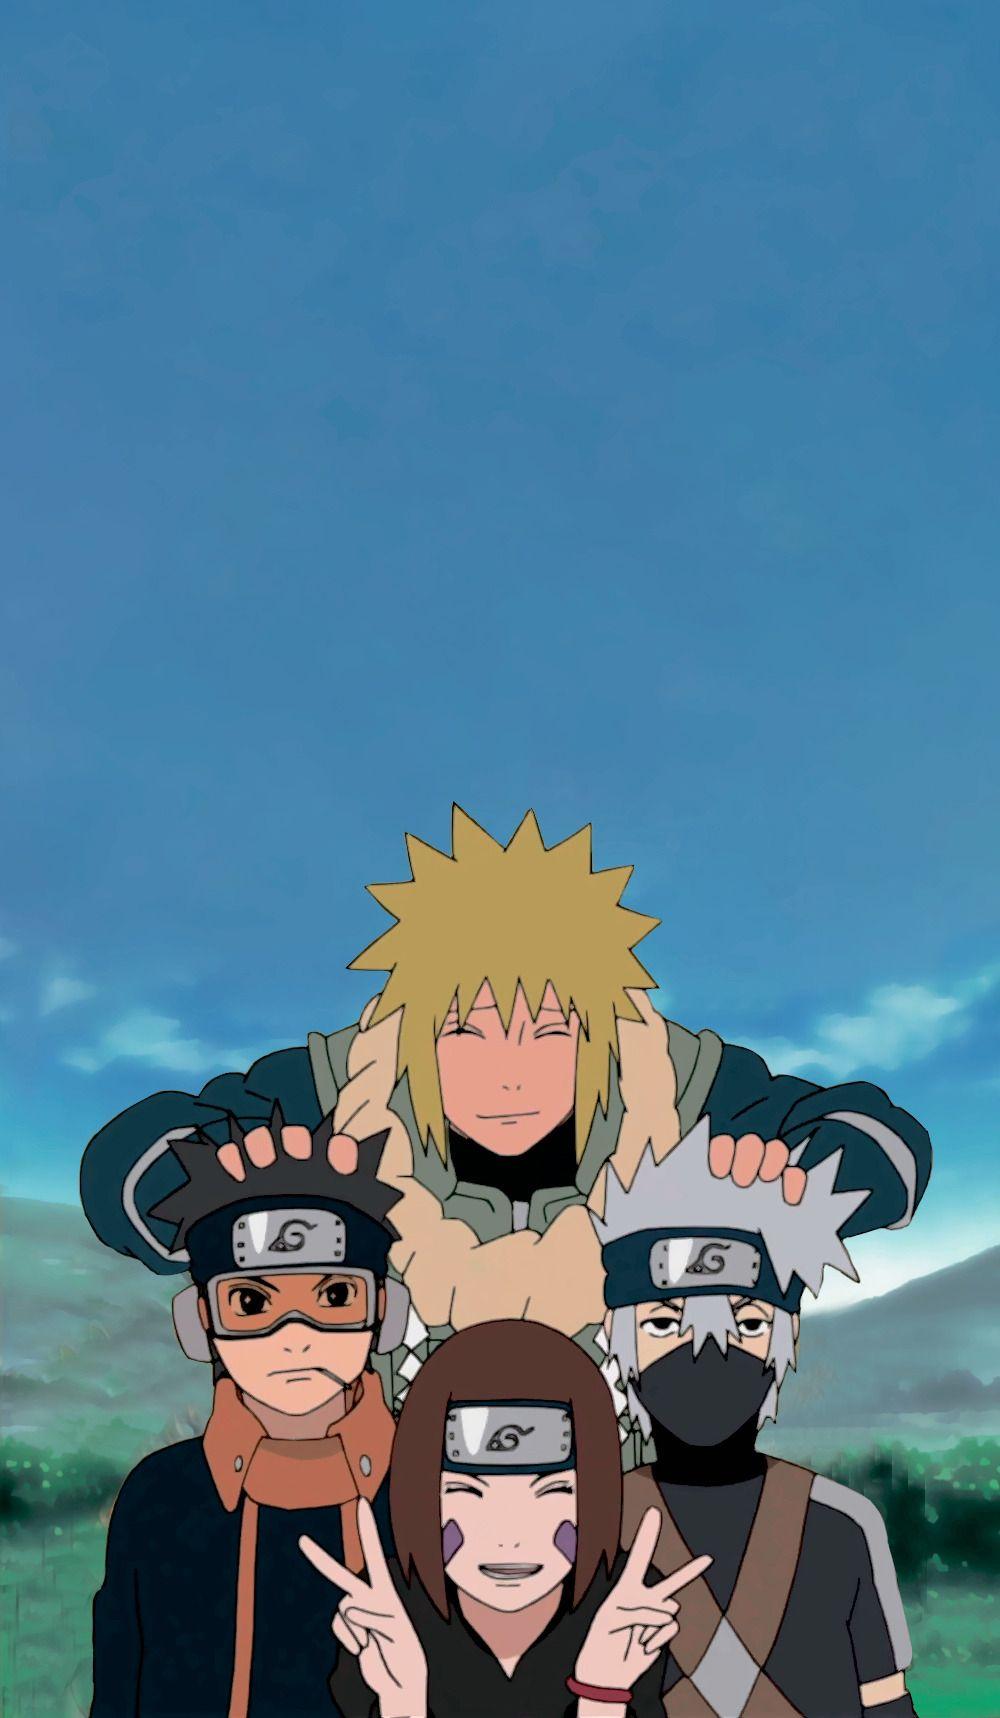 Unduh 6700 Wallpaper Naruto Dan Minato Paling Keren